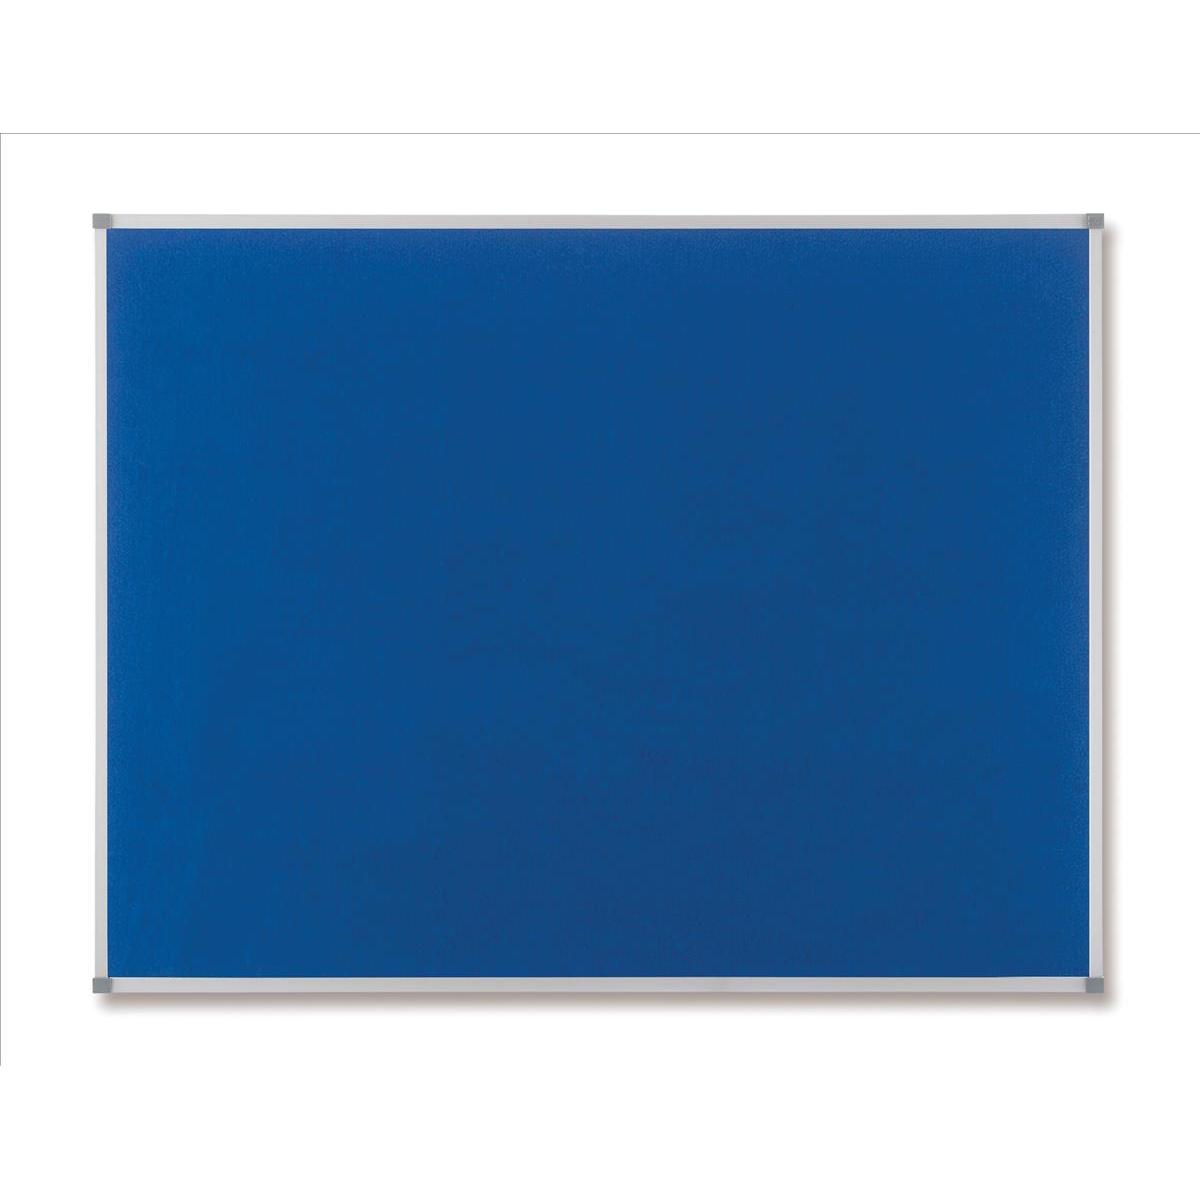 Felt Nobo Classic Noticeboard Felt with Aluminium Frame W1200xH900mm Blue Ref 1900916